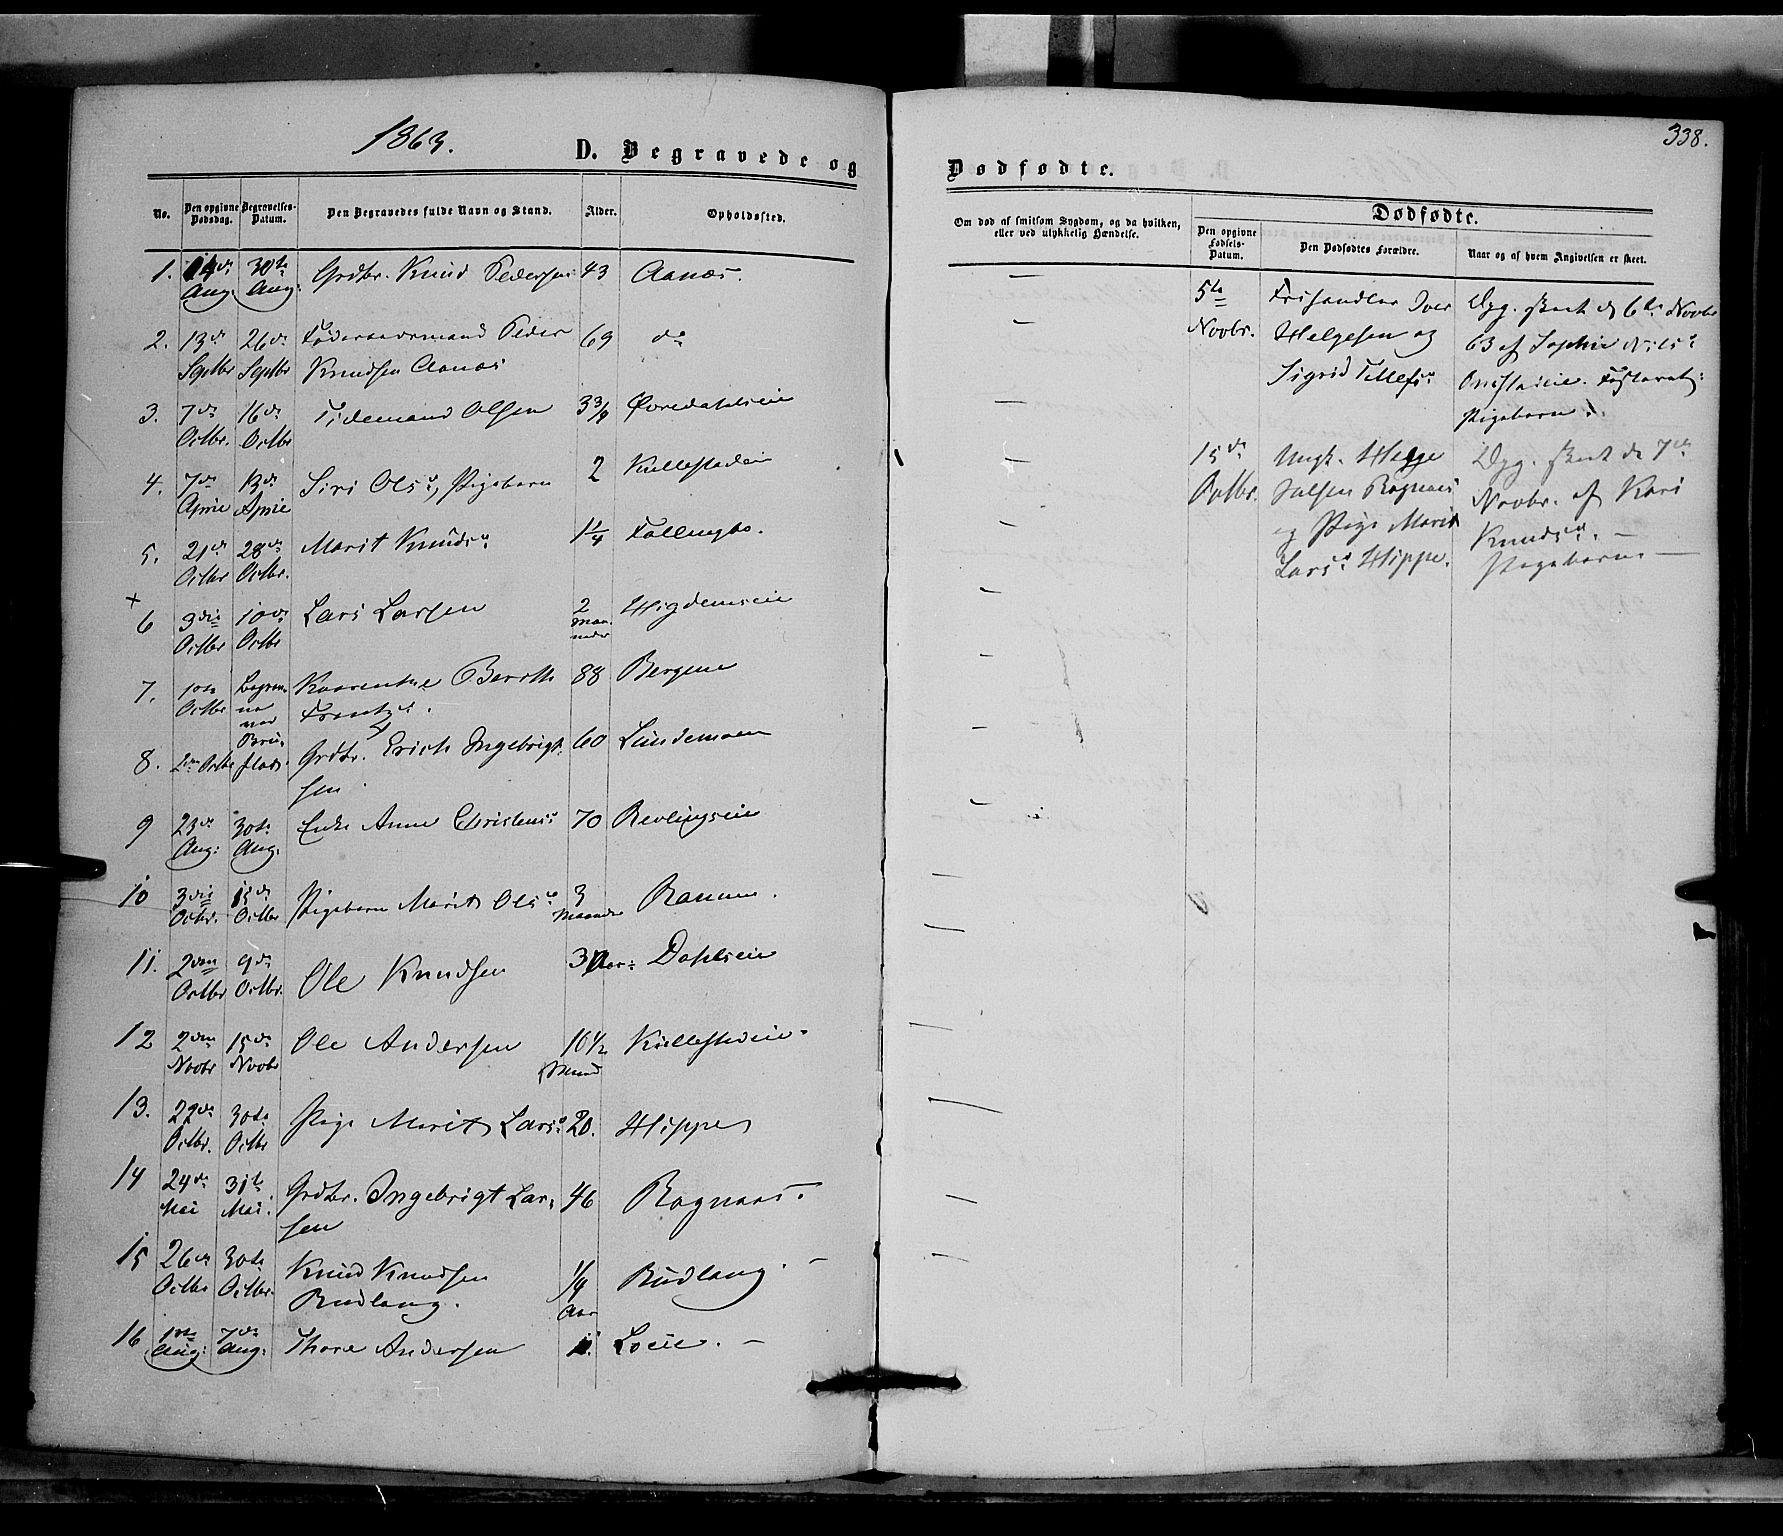 SAH, Nord-Aurdal prestekontor, Ministerialbok nr. 8, 1863-1875, s. 338